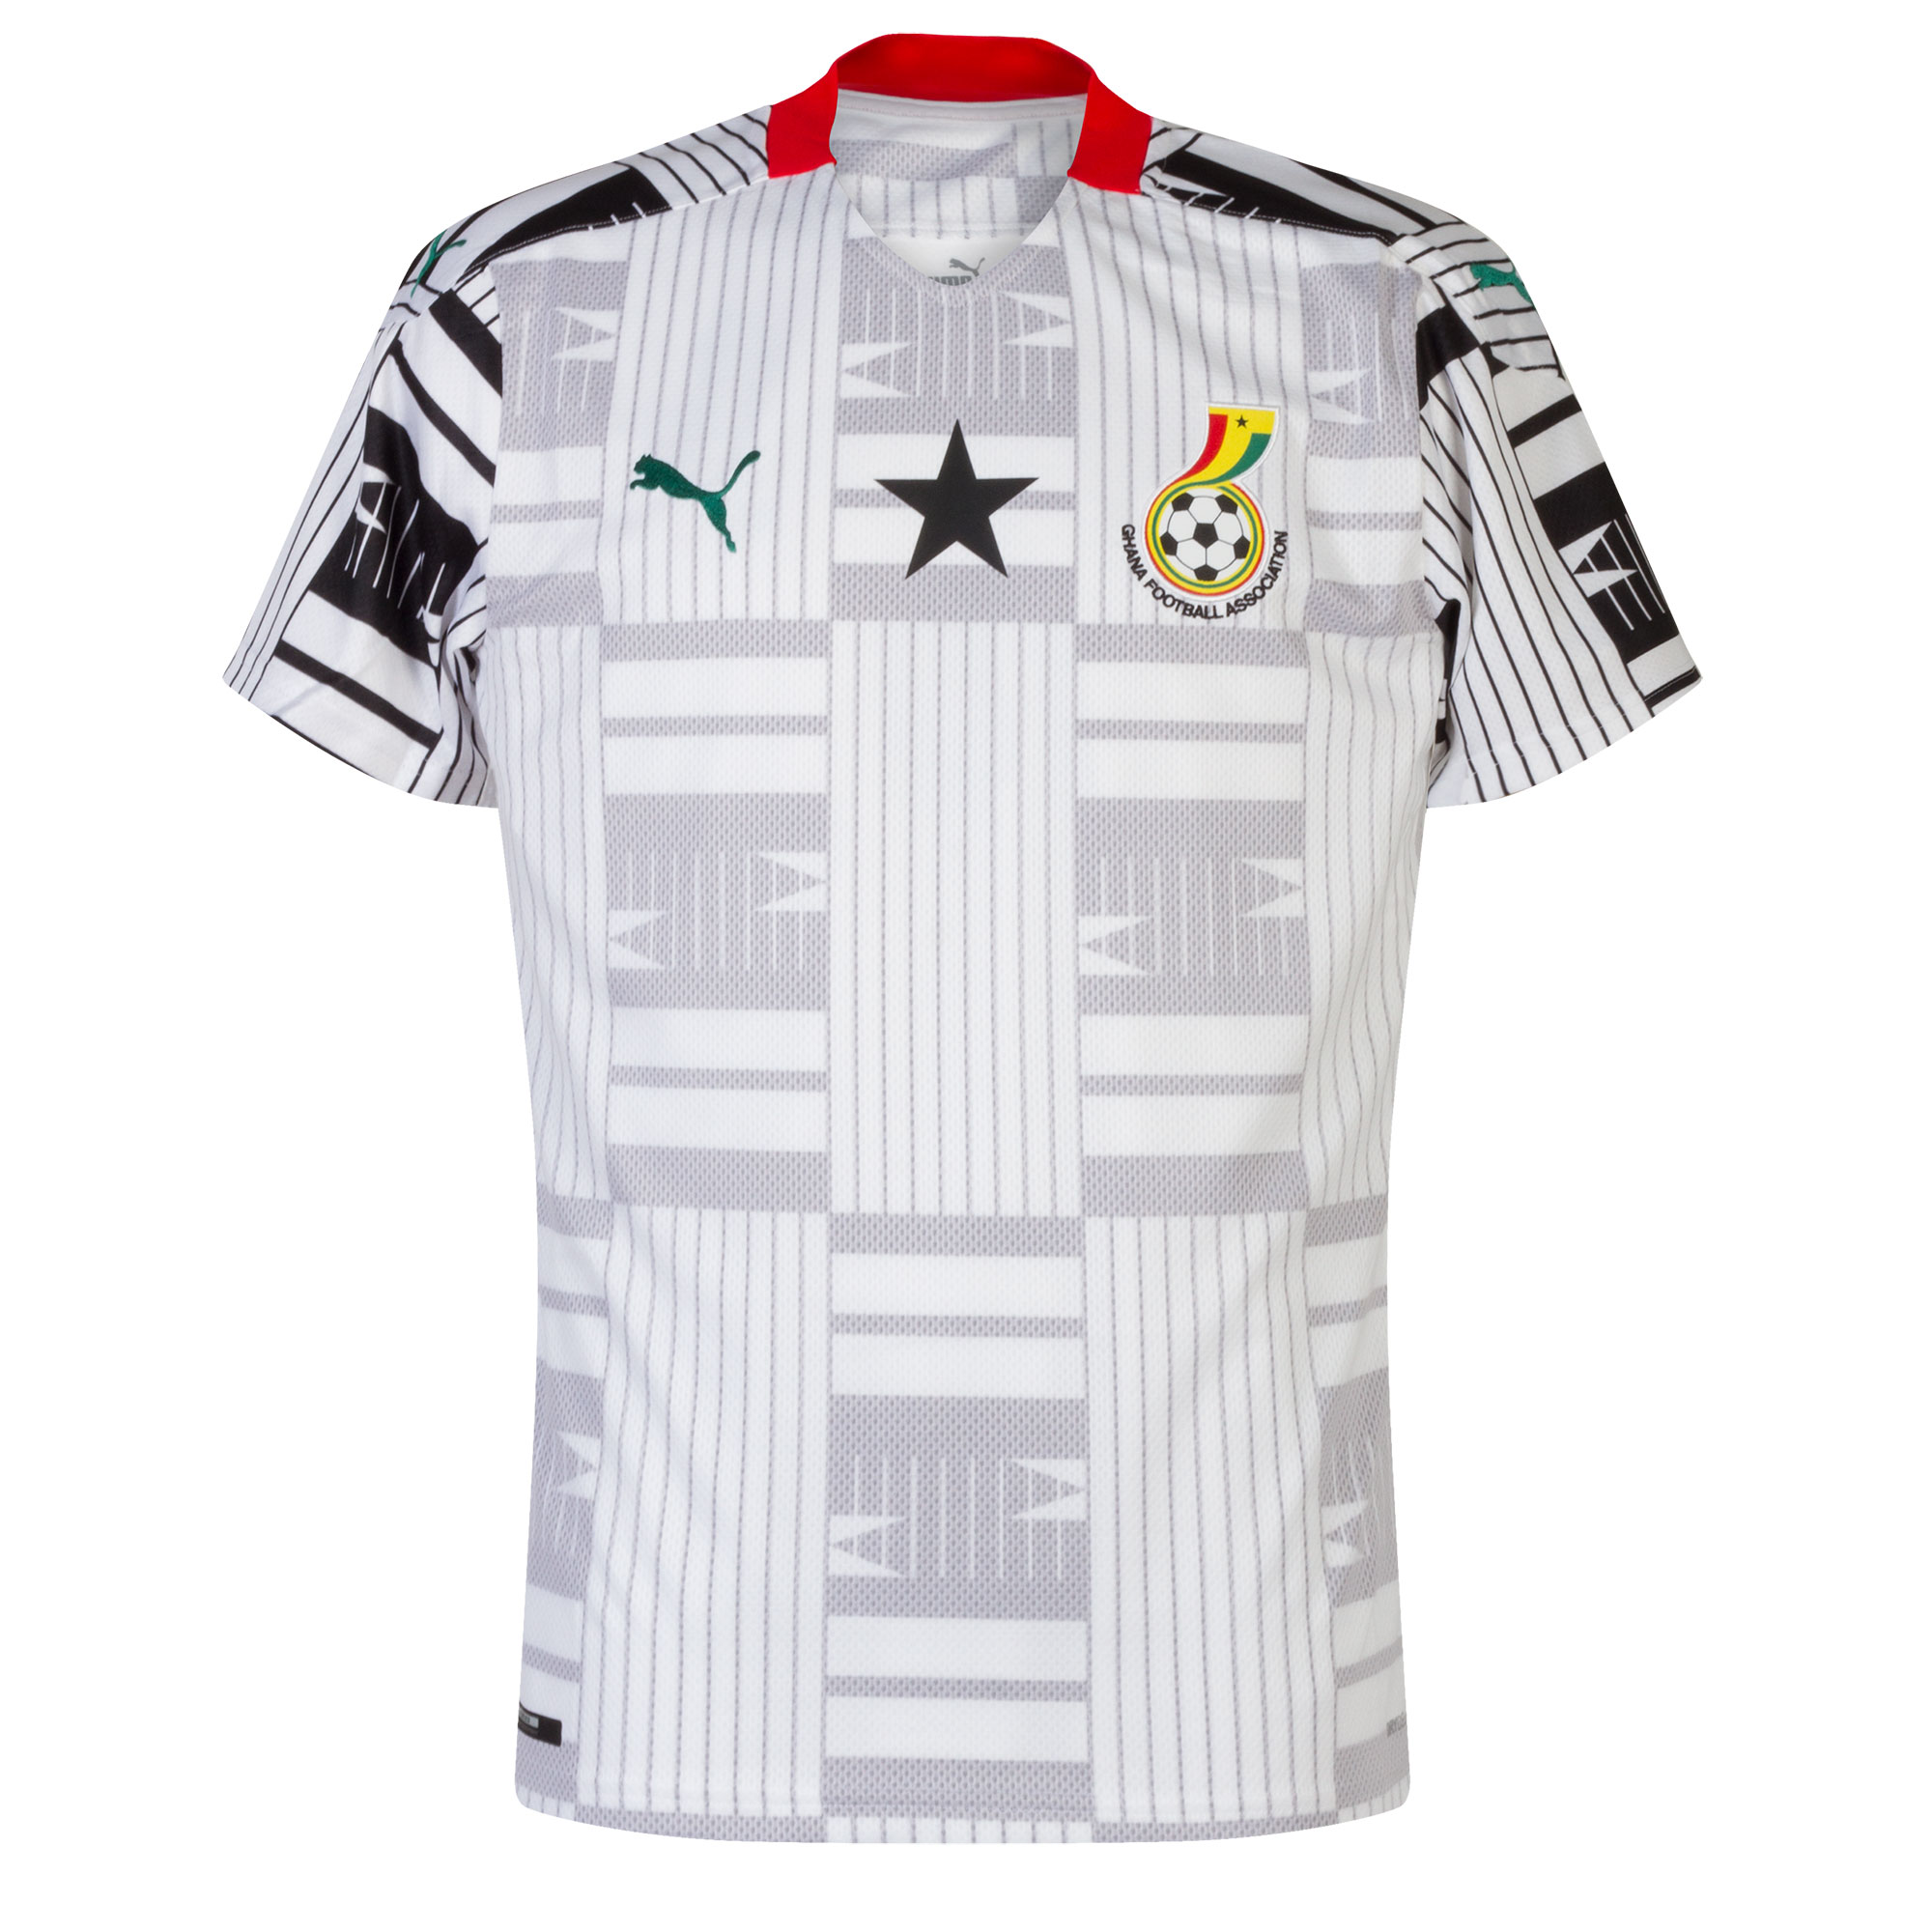 Puma Ghana Home Shirt 2020-2021